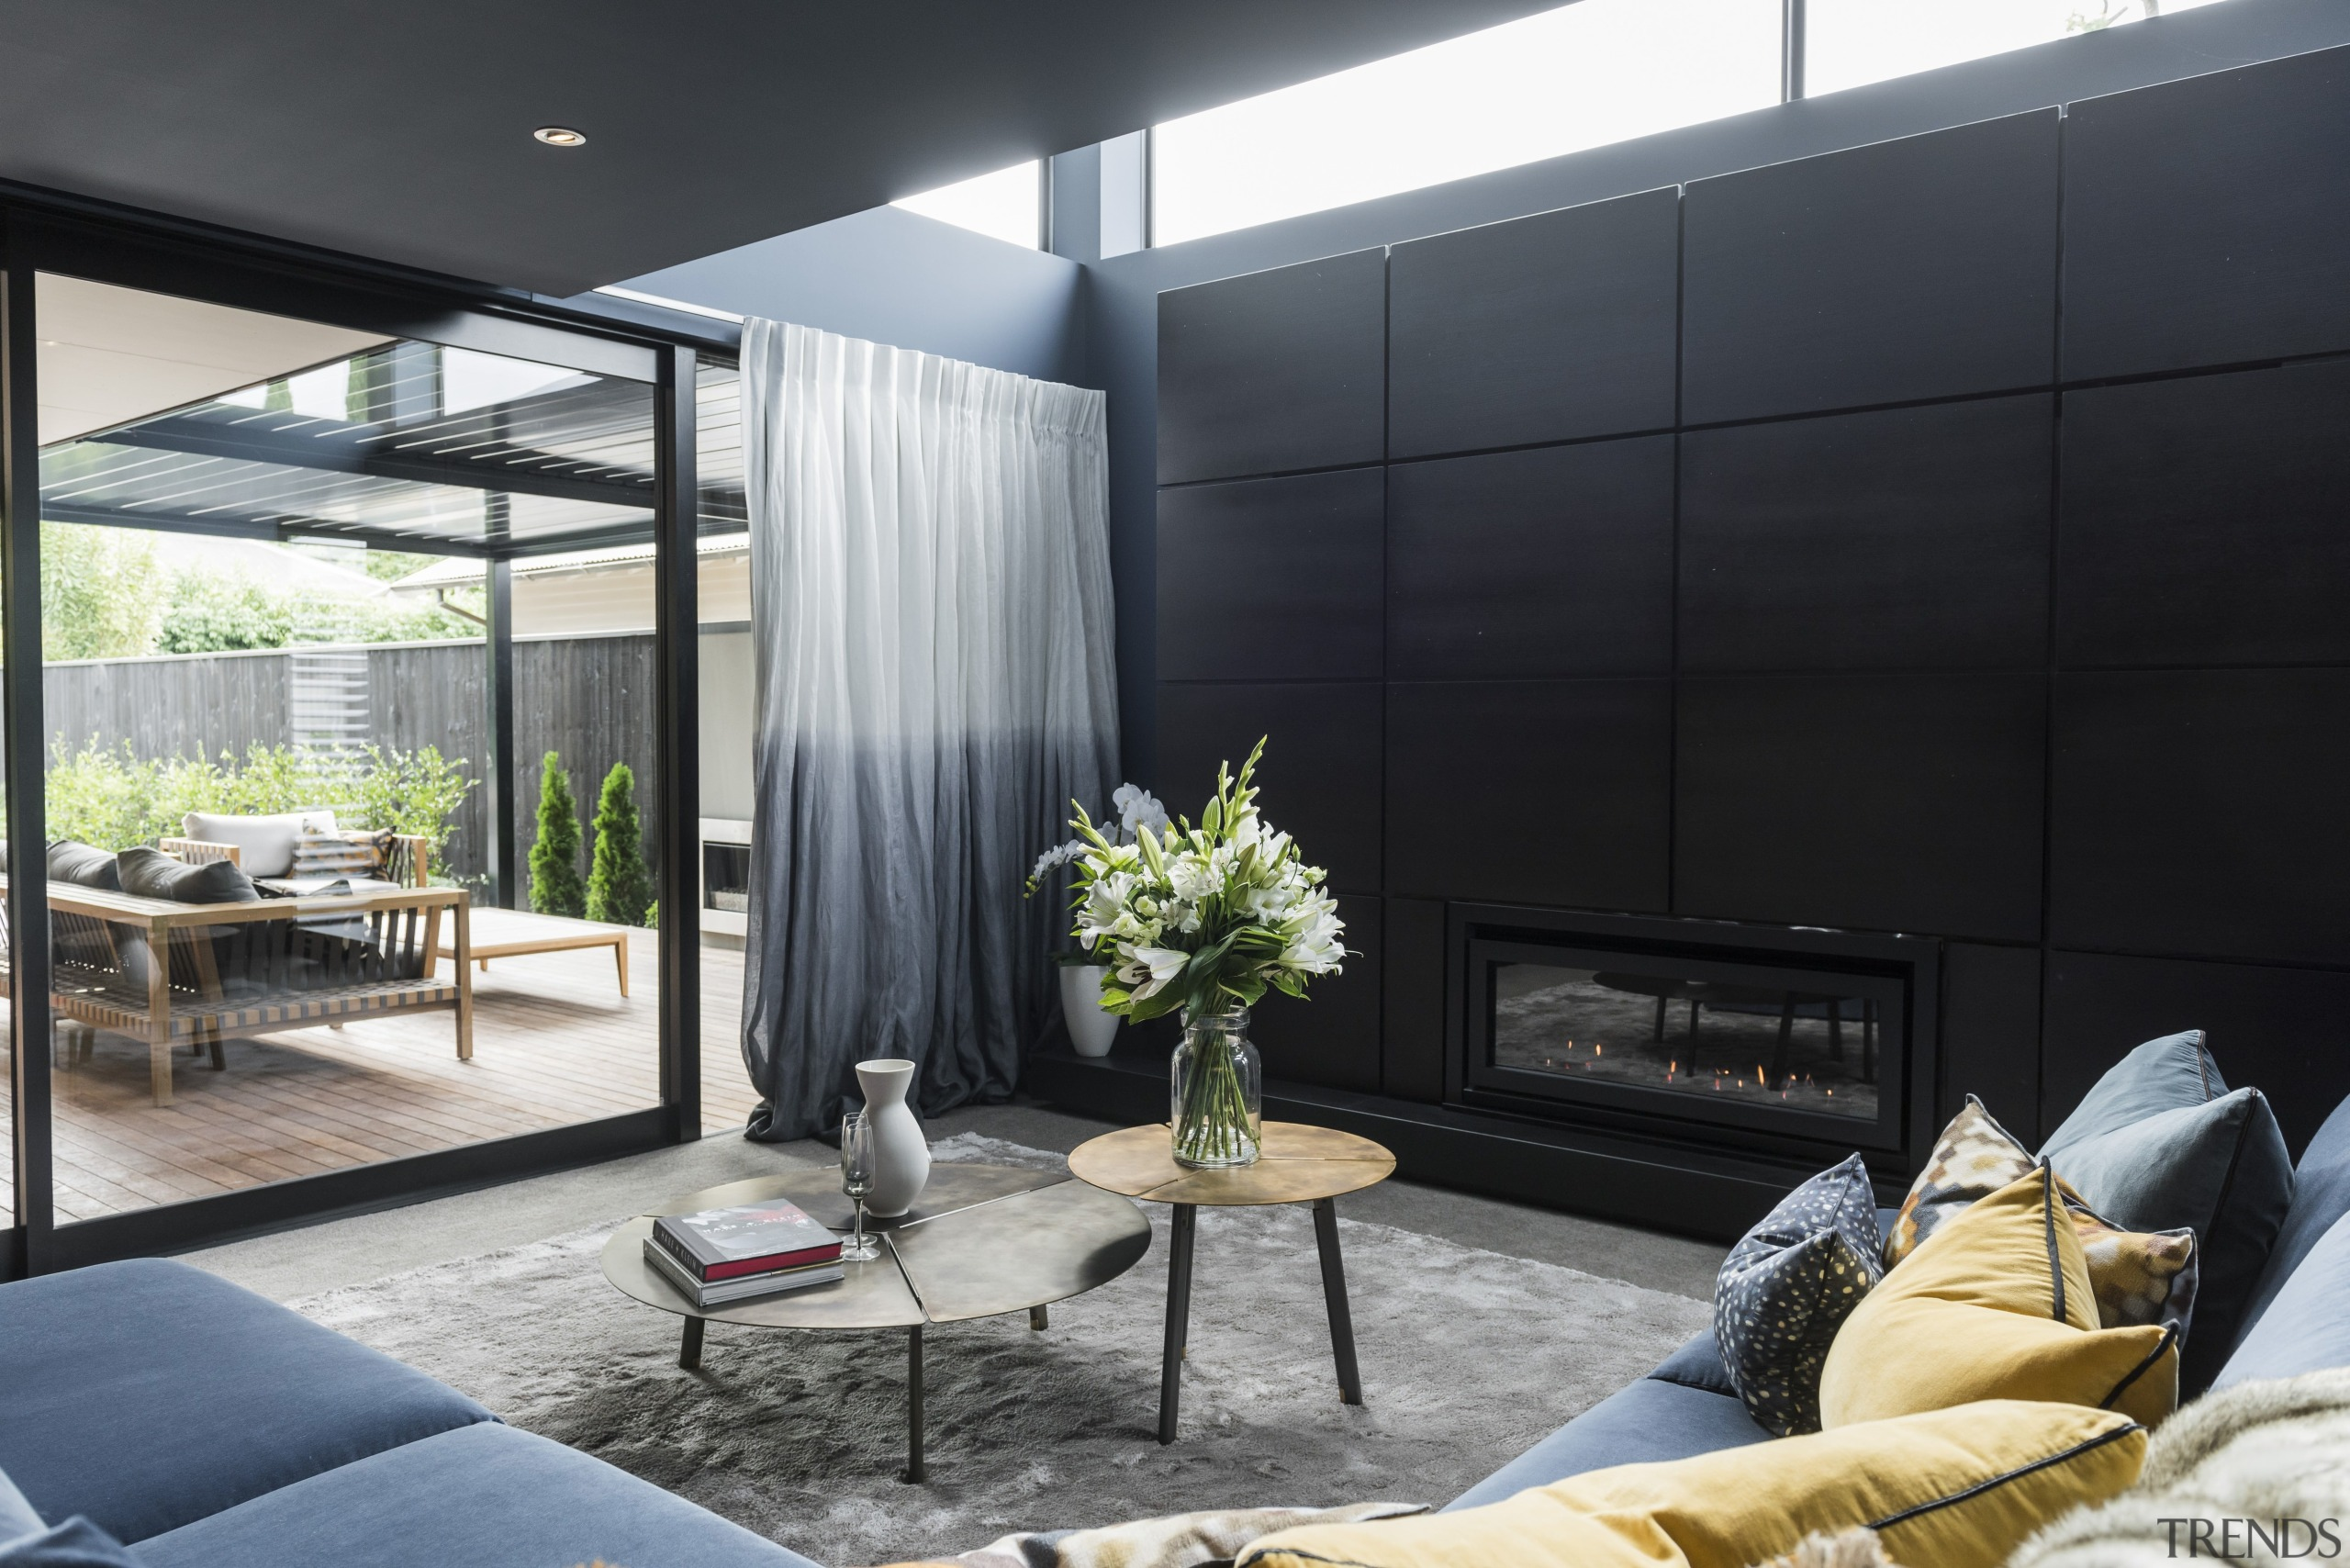 TIDA NZ 2017 – Designer new home winner architecture, home, house, interior design, living room, real estate, window, black, gray